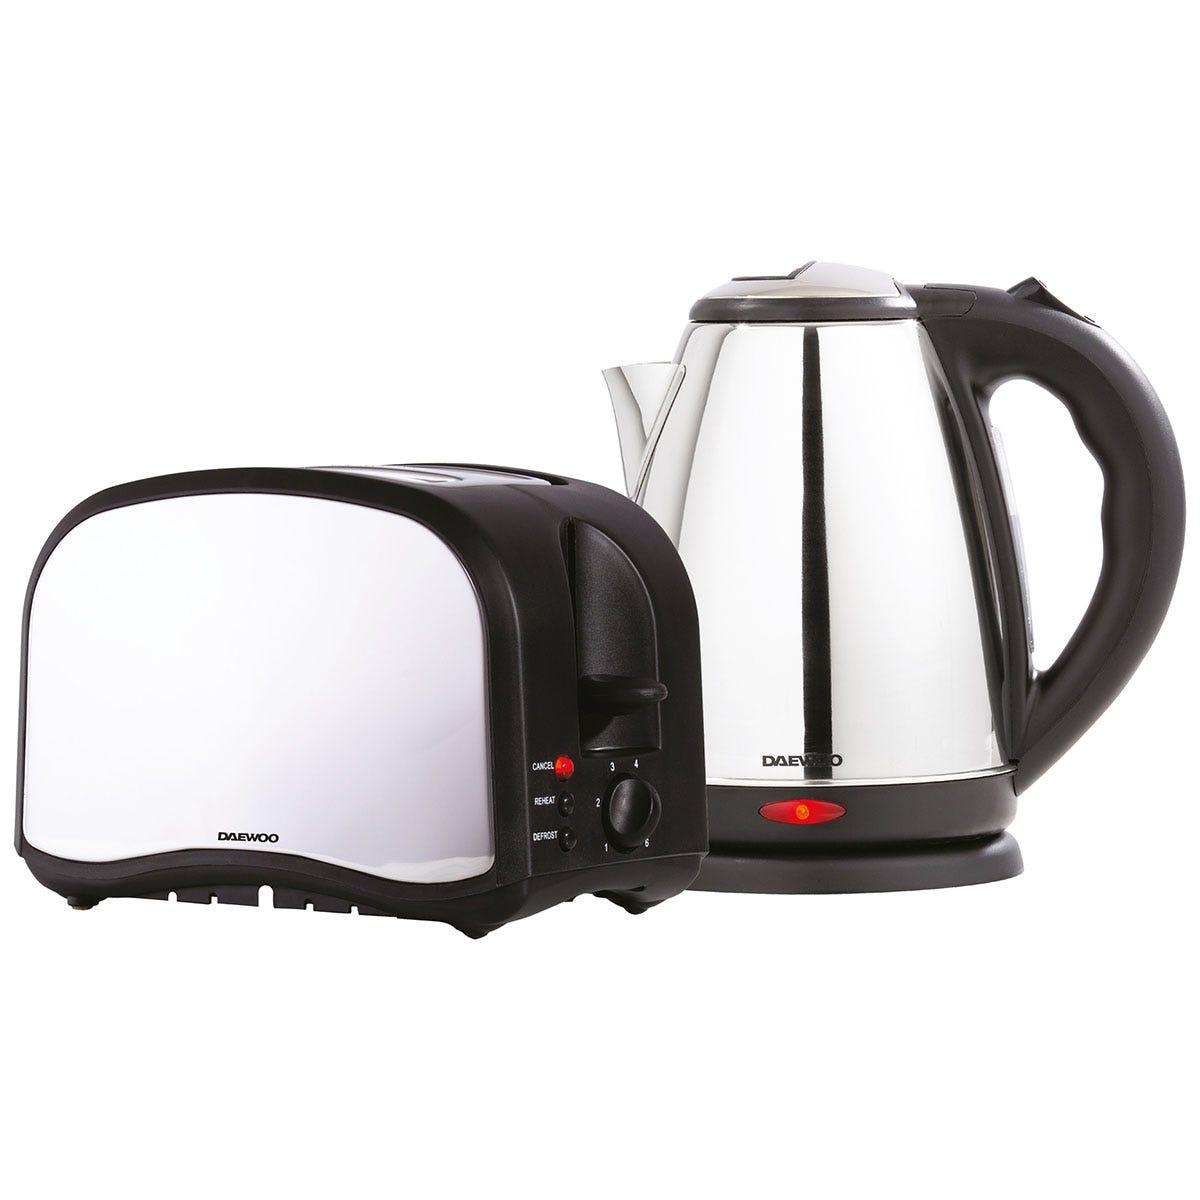 Daewoo SDA1713 1.8L Jug Kettle and 2-Slice Toaster Set - Polished Stainless Steel